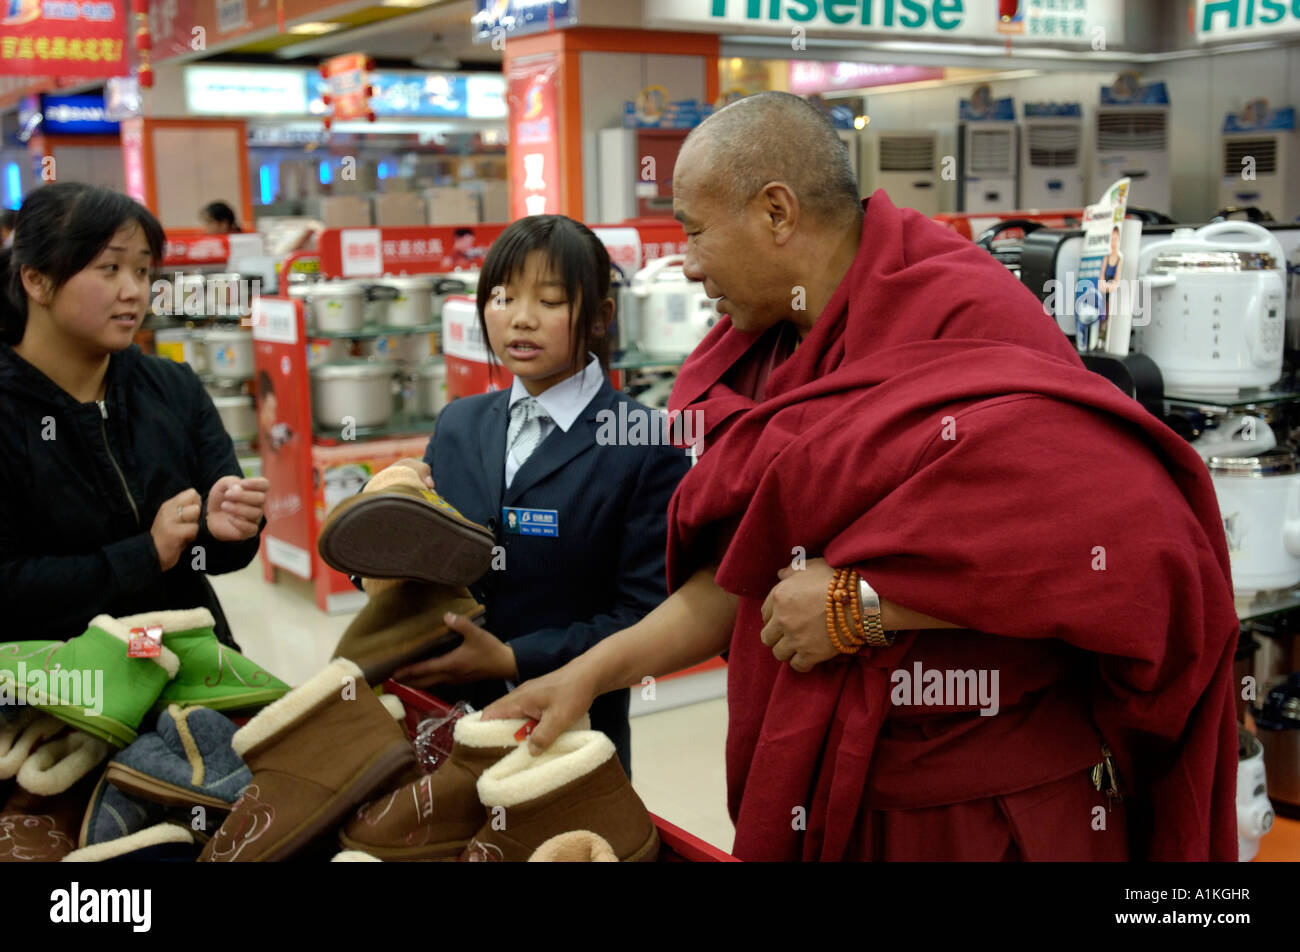 Tibetan monks shopping in a supermarket in Lhasa Tibet China 22 OCT 2006 - Stock Image